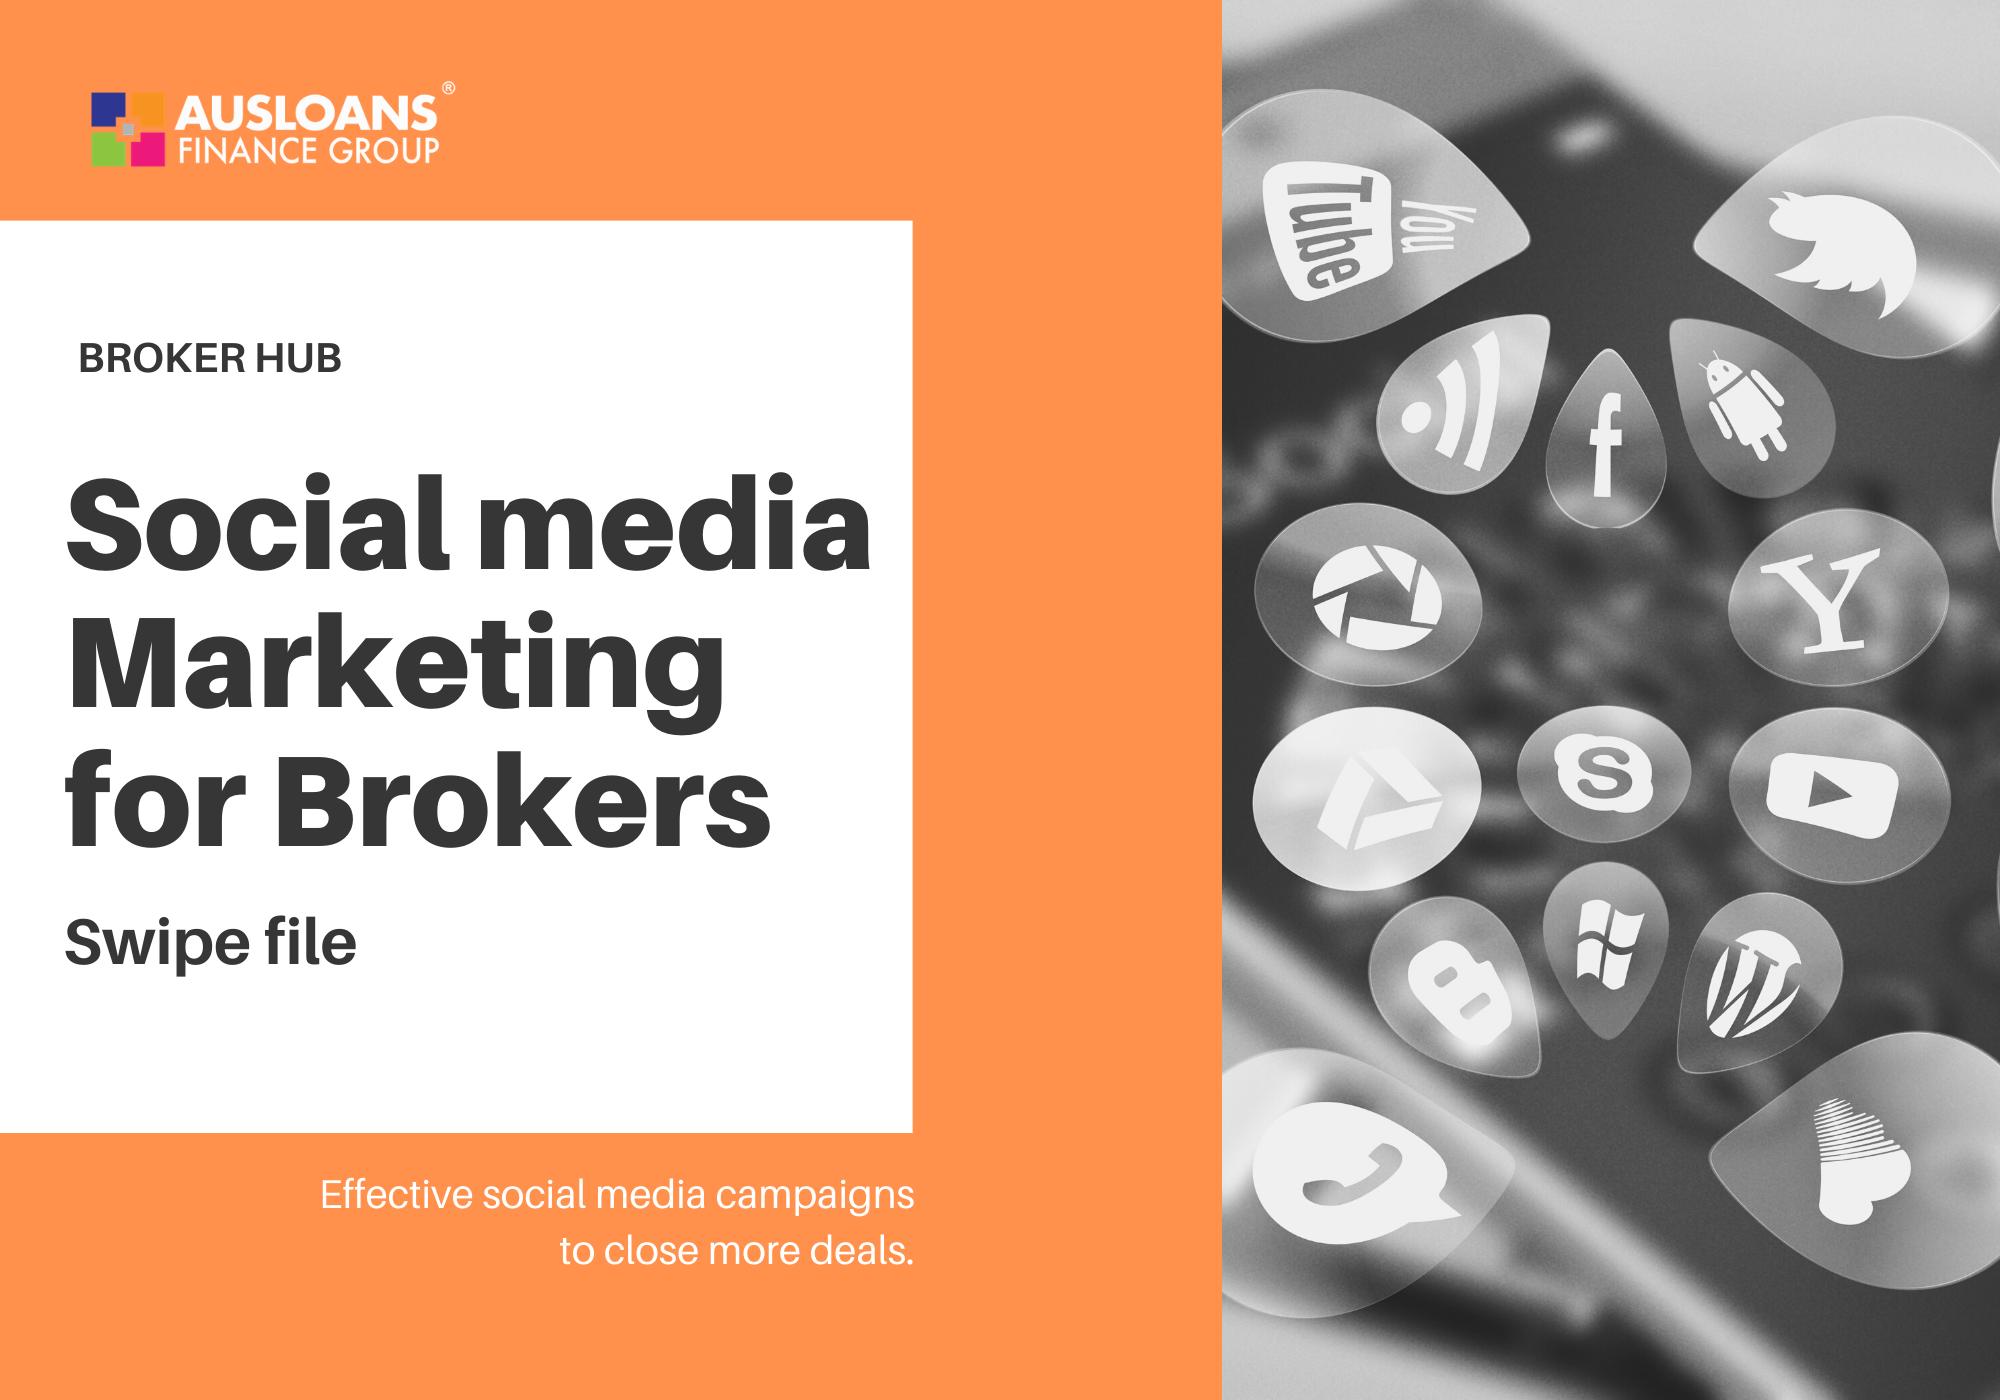 Ausloans marketing support brokers social media